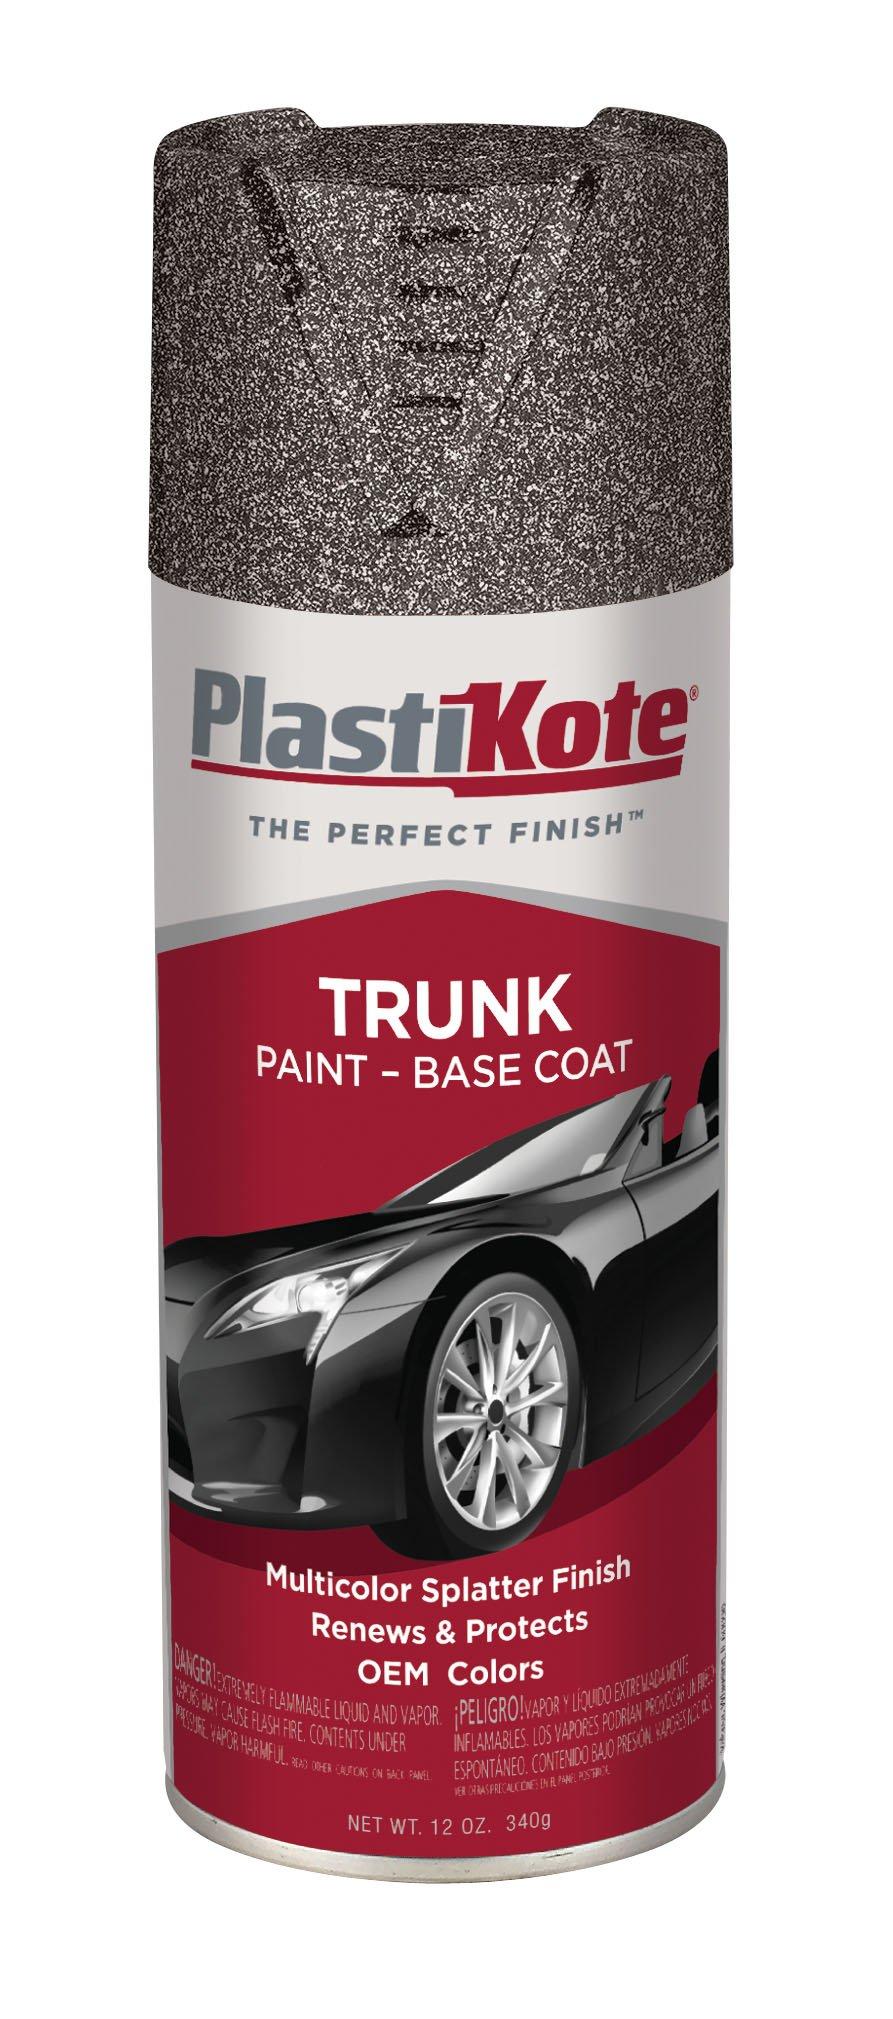 PlastiKote 503 Gray/Black/White Trunk Paint, 12 oz.